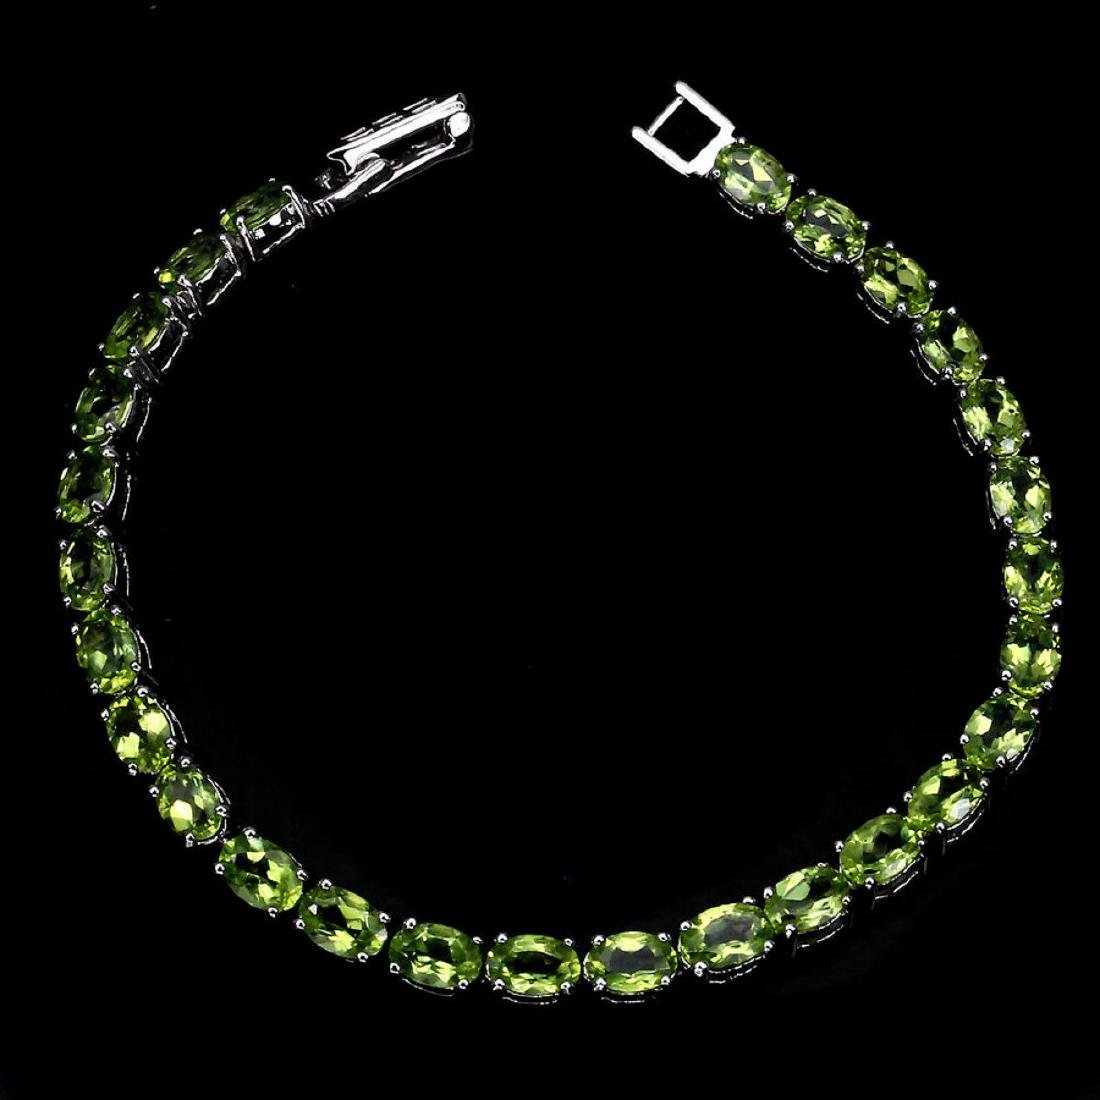 Natural Rich Green Peridot 60 Carats Bracelet - 2